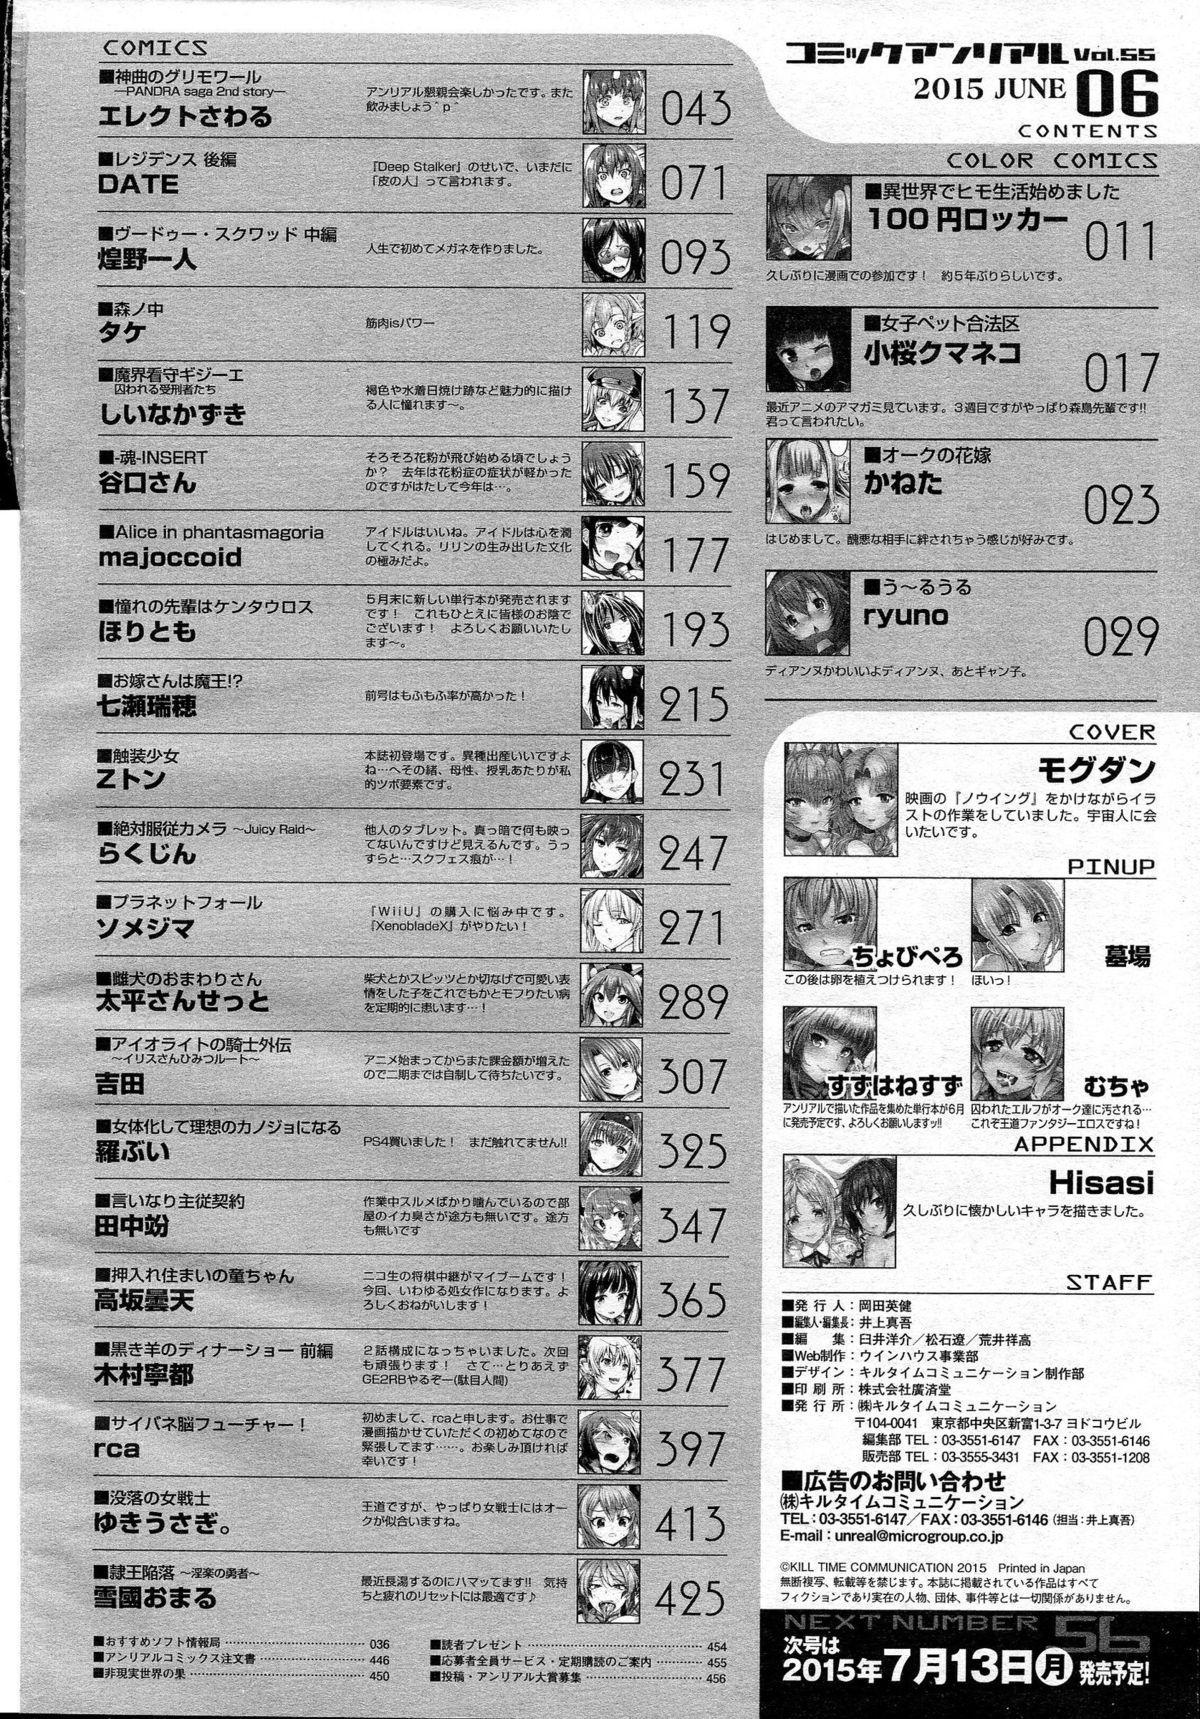 COMIC Unreal 2015-06 Vol. 55 + Hisasi Illust Shuu 455